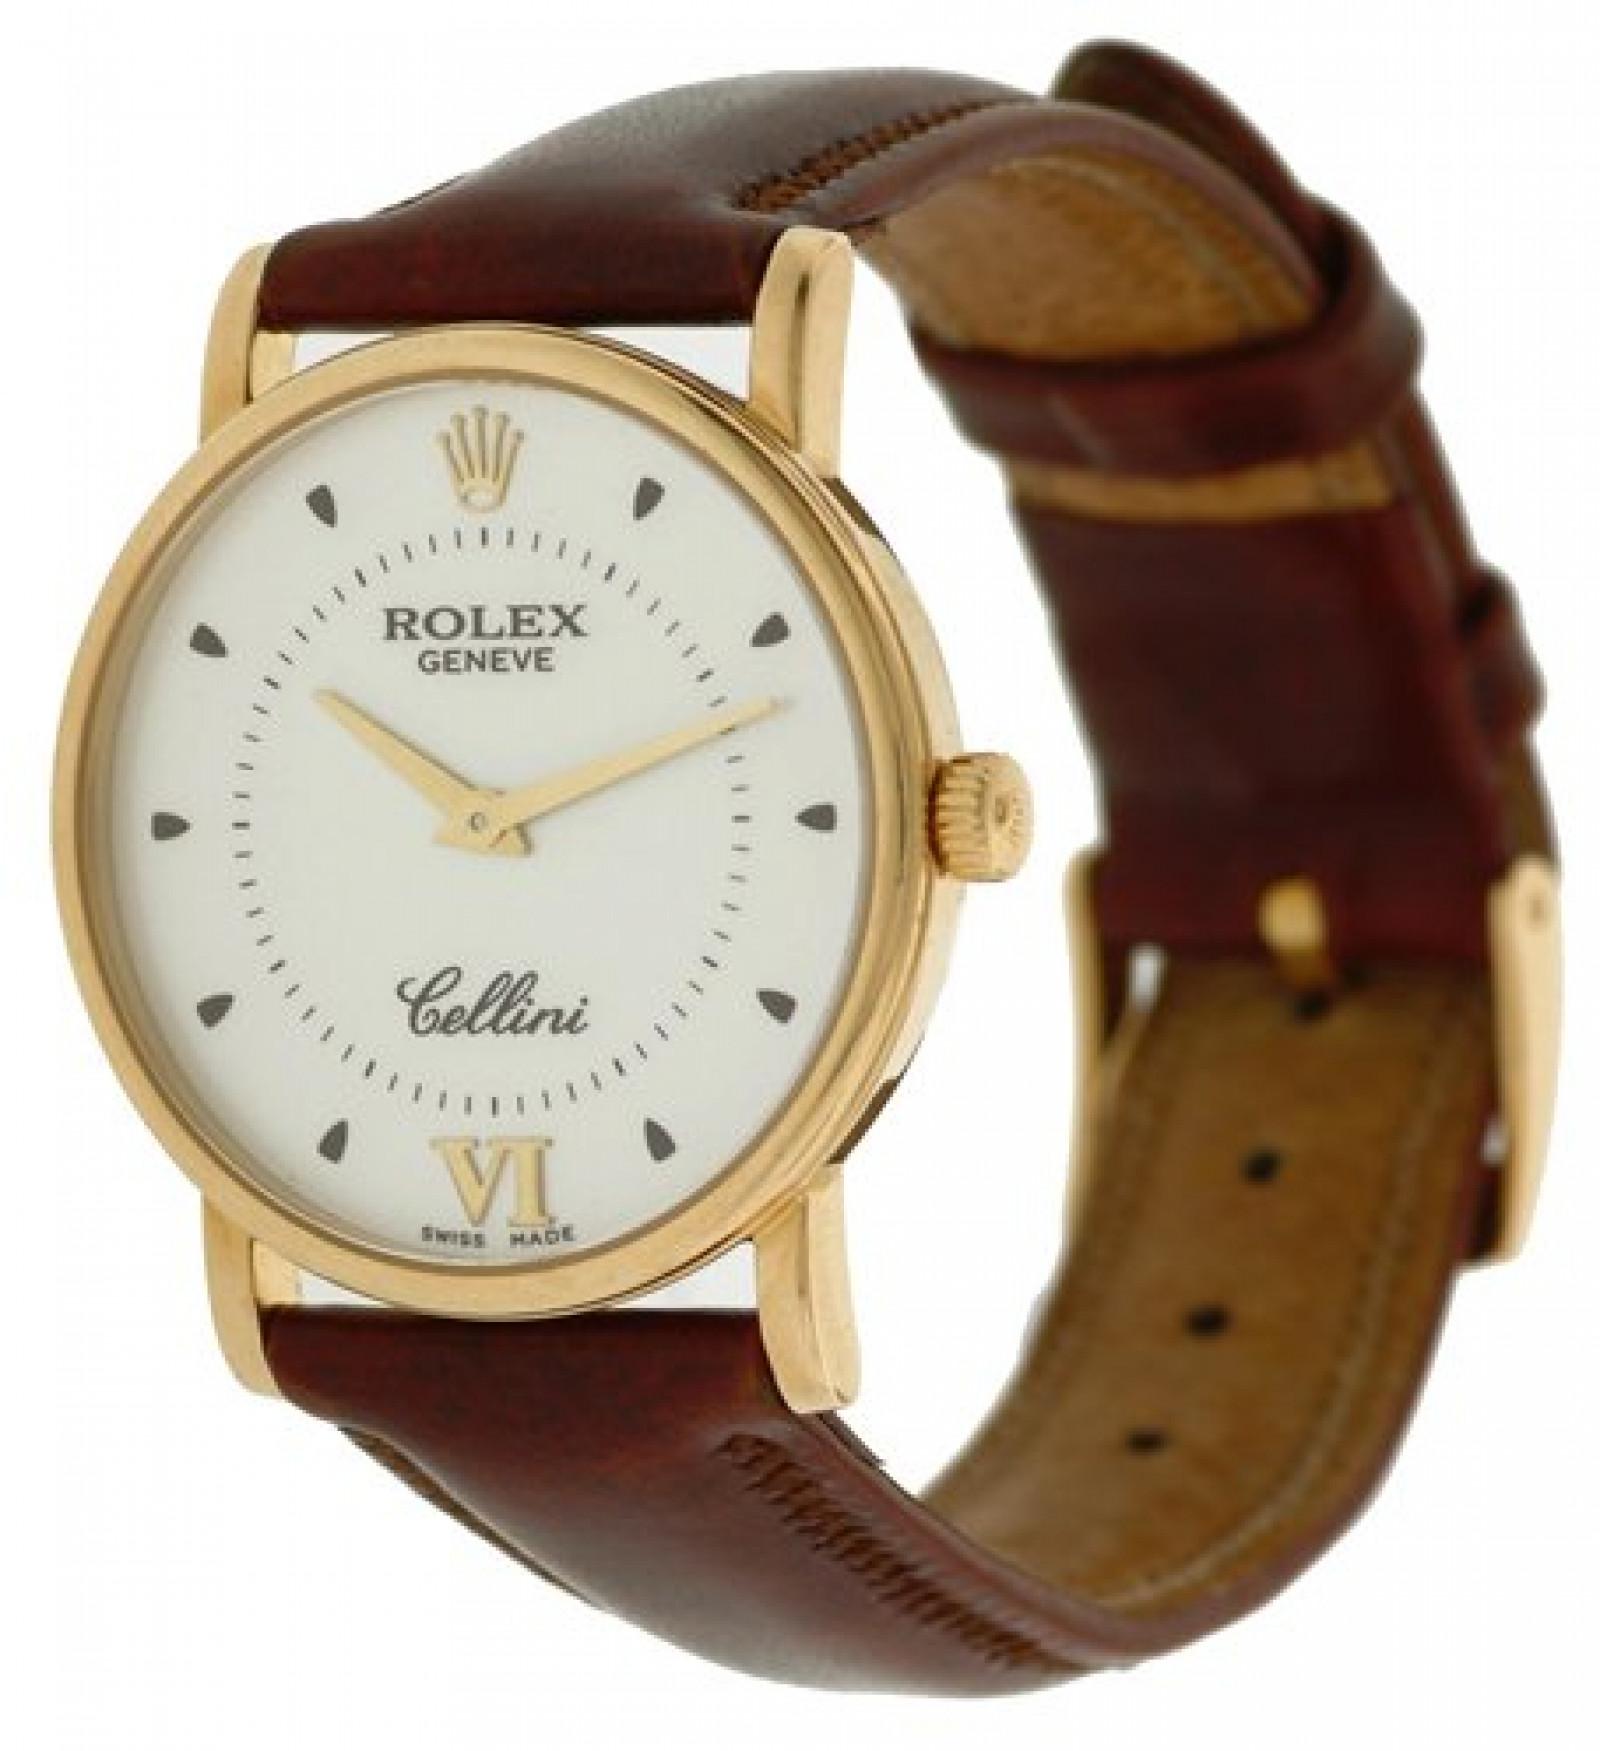 Rolex Cellini 5115 Gold Year 1998